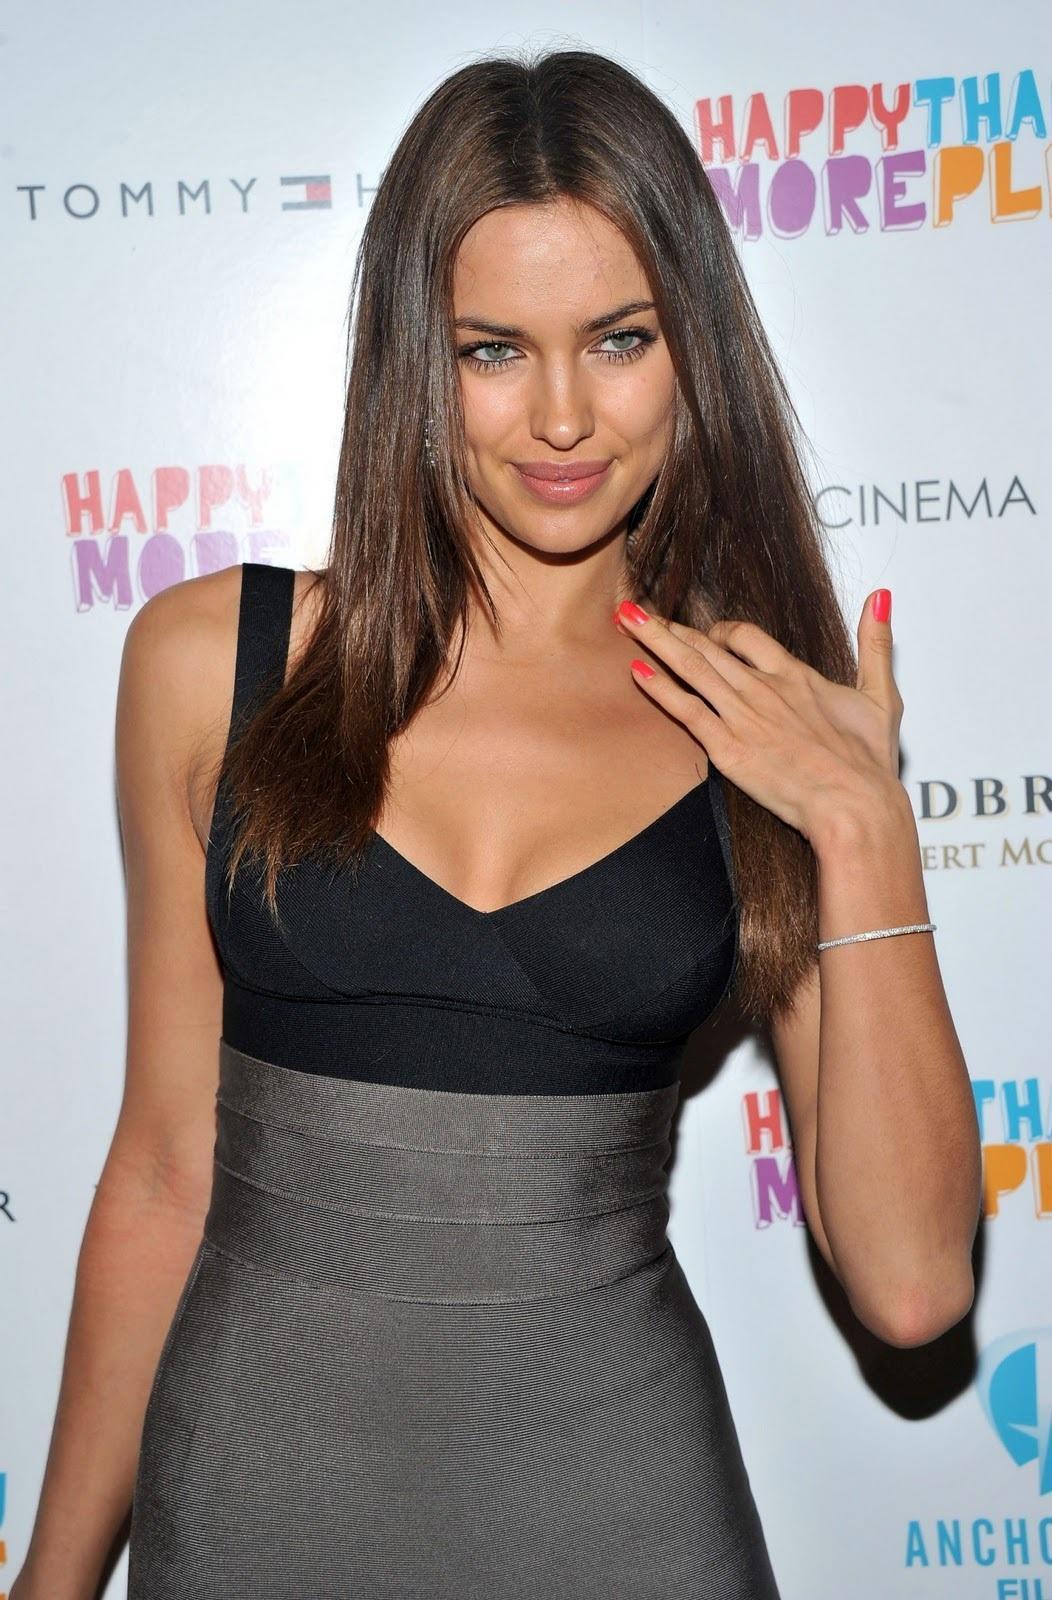 Irina Shayk Biography And Latest Photos 2013 World Celebrities Hd Wallpapers